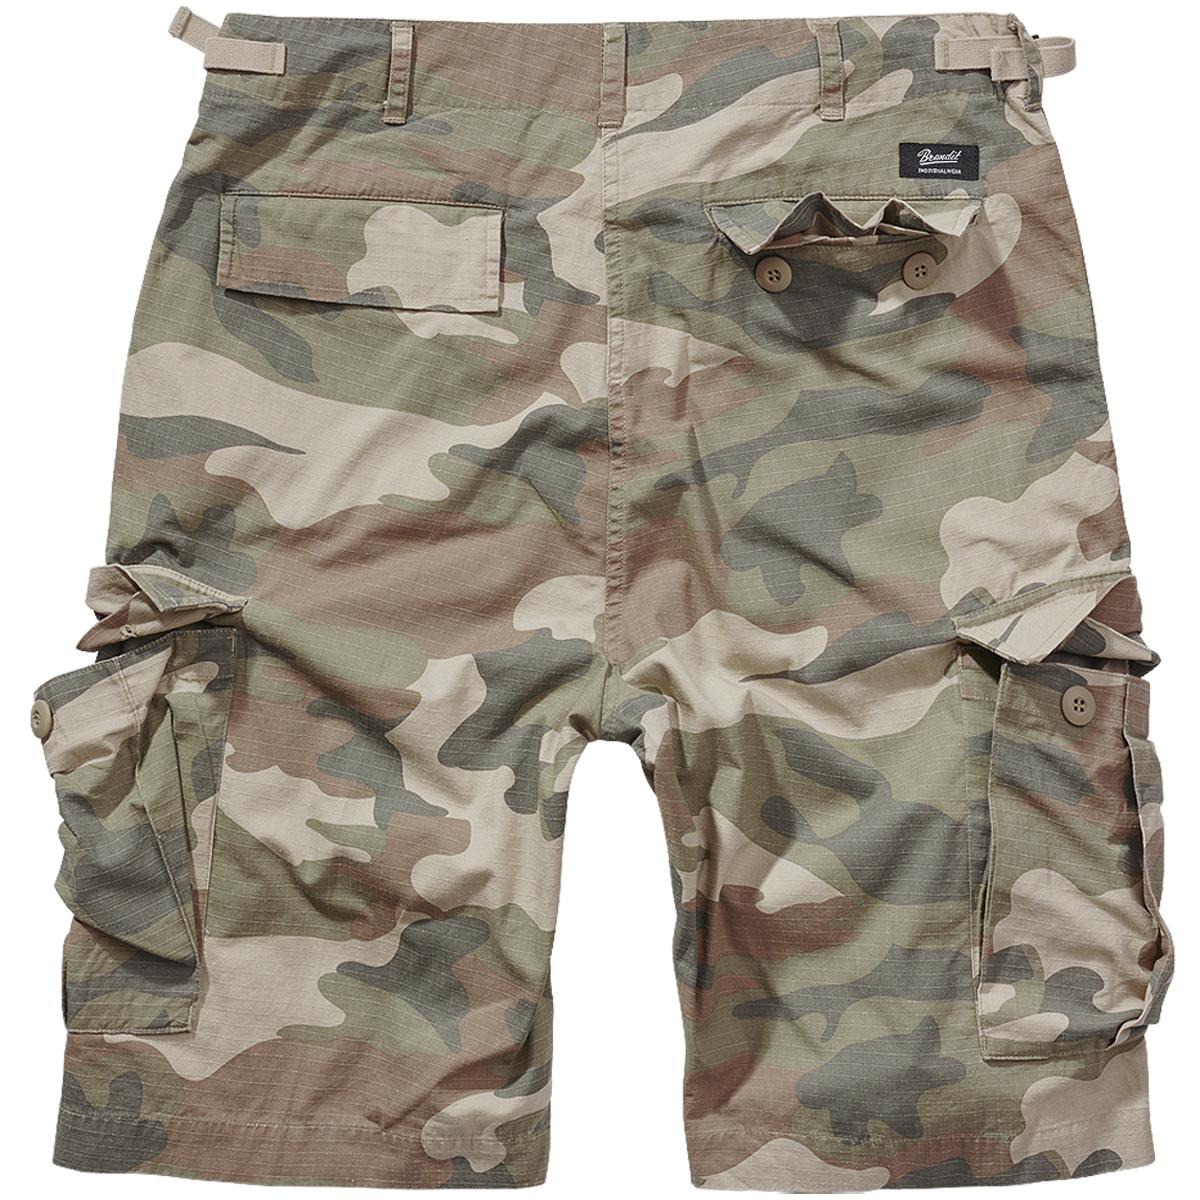 Brandit-BDU-Ripstop-Shorts-S-7XL-Army-Cargo-Bermuda-Outdoor-Short-kurze-Hose miniatura 19